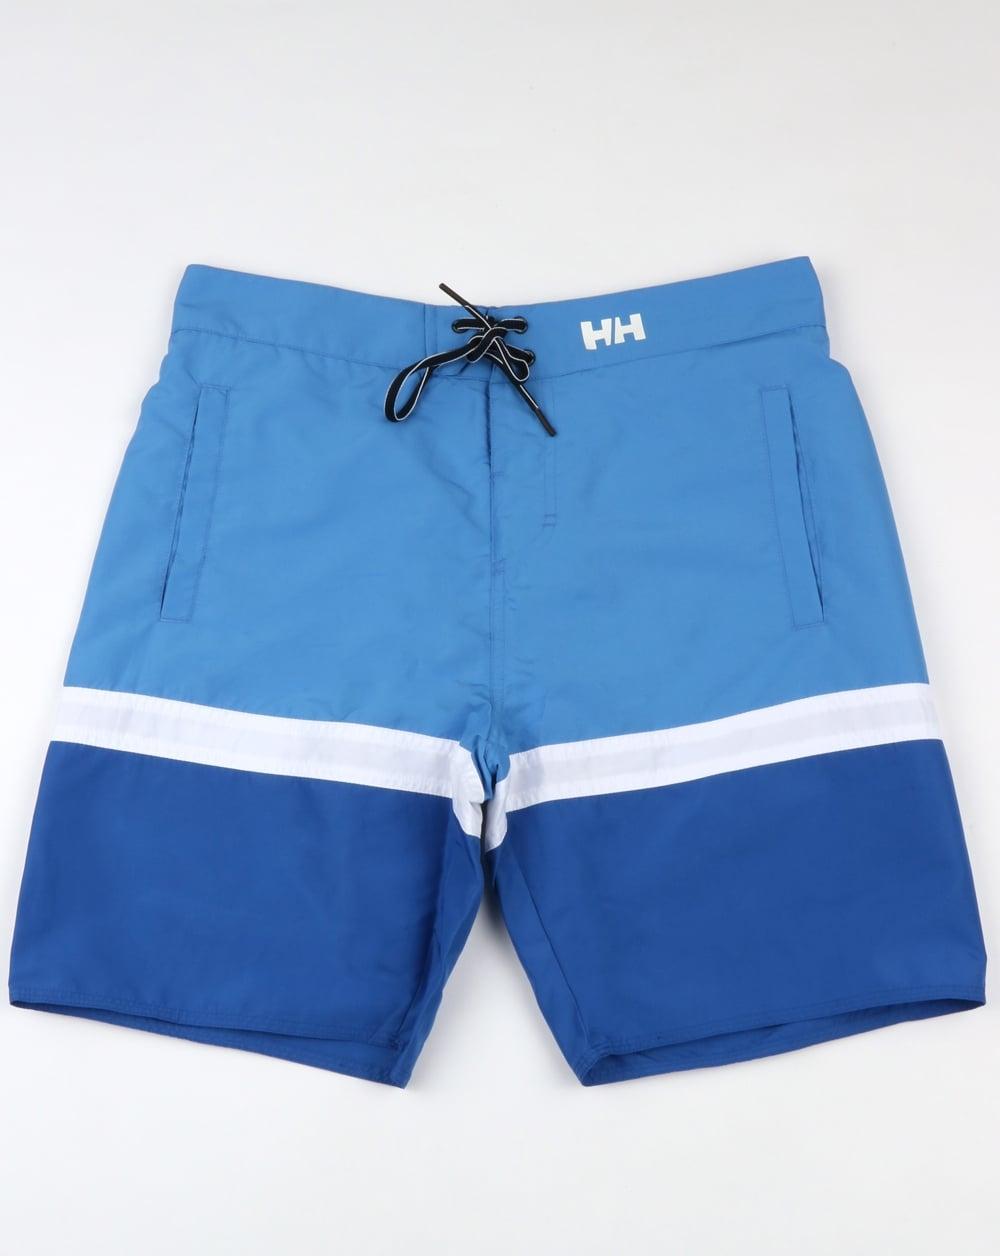 9b31db8698875 Helly Hansen Marstrand Swim Shorts Blue Water   80s casual classics